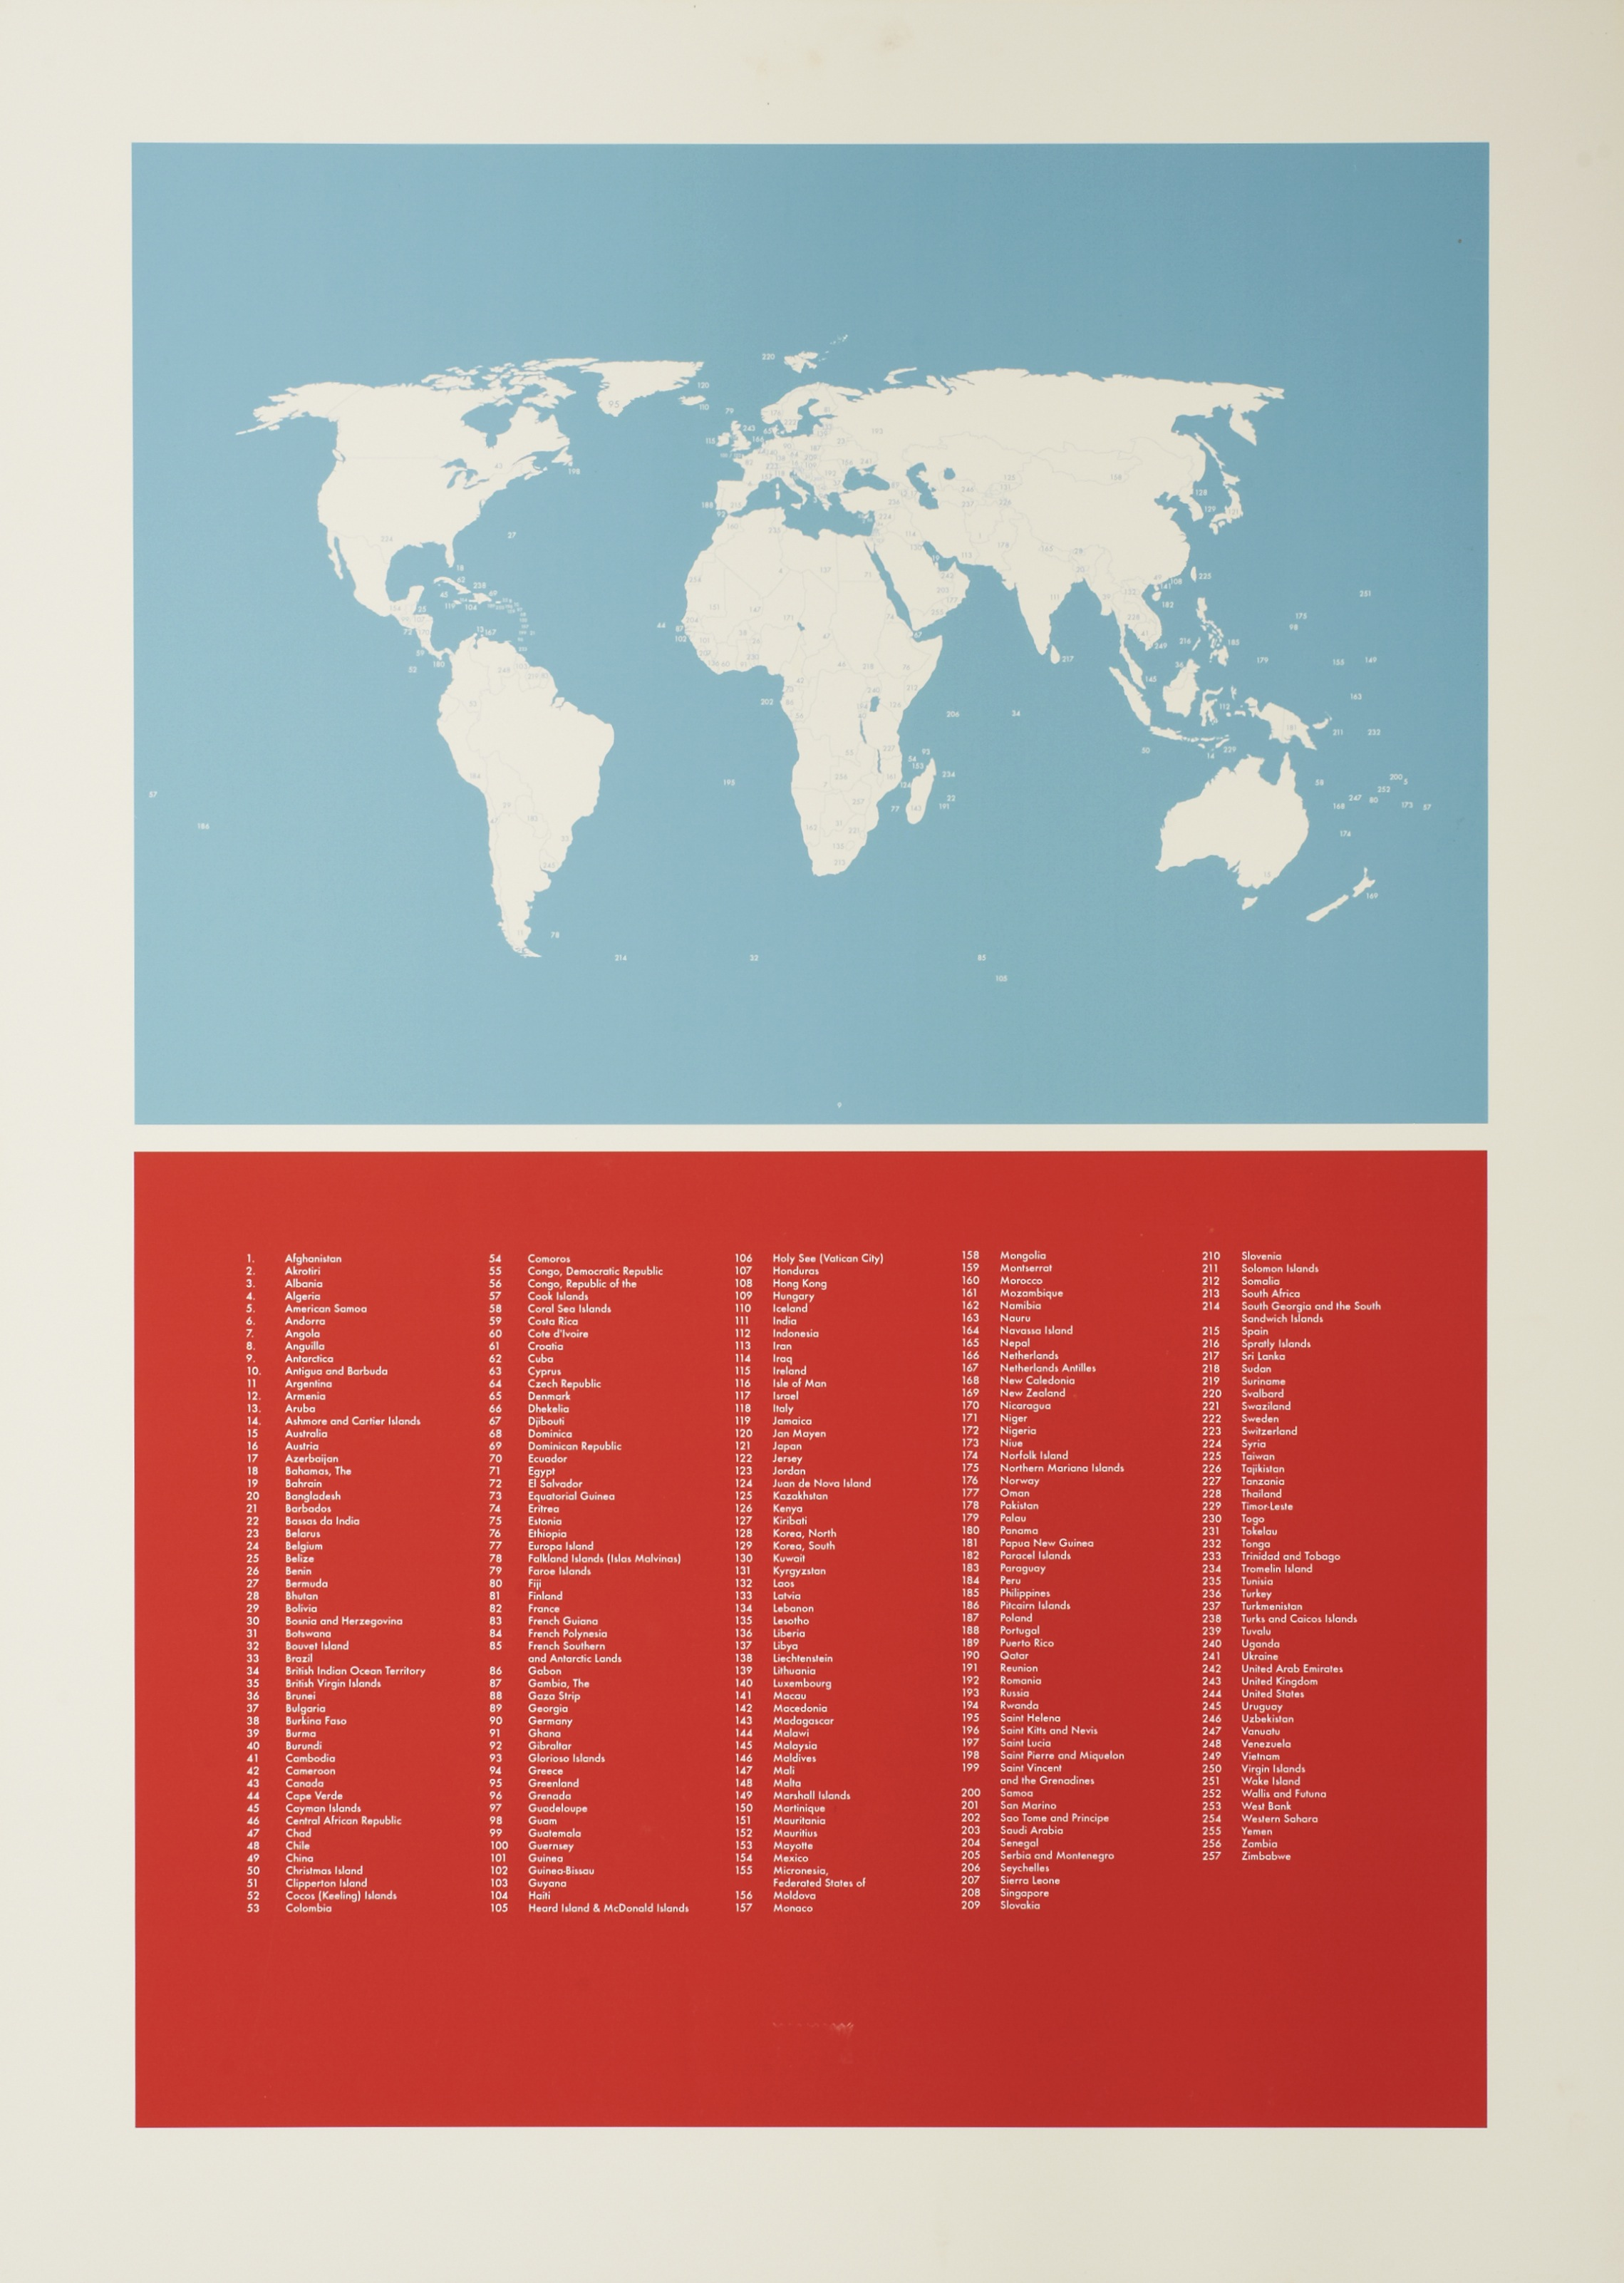 Lane-world-map-print.jpg